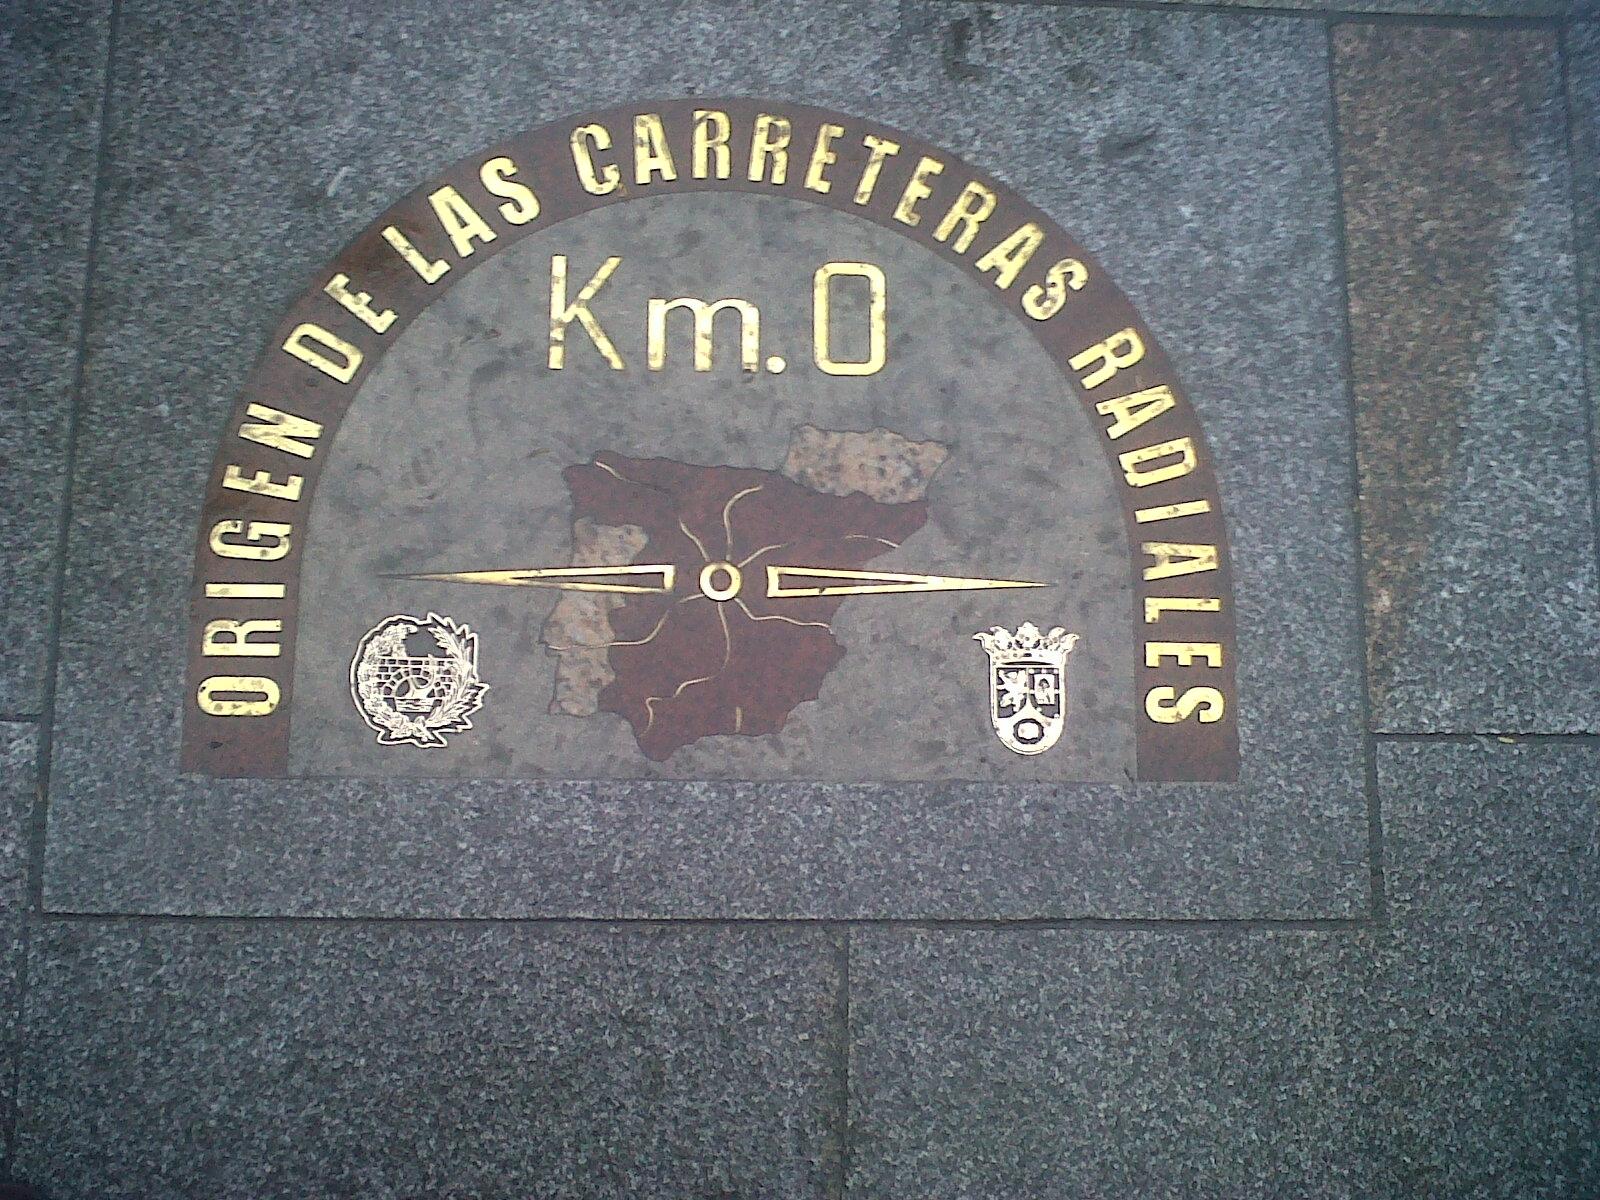 Km 0 for Kilometro 0 puerta del sol